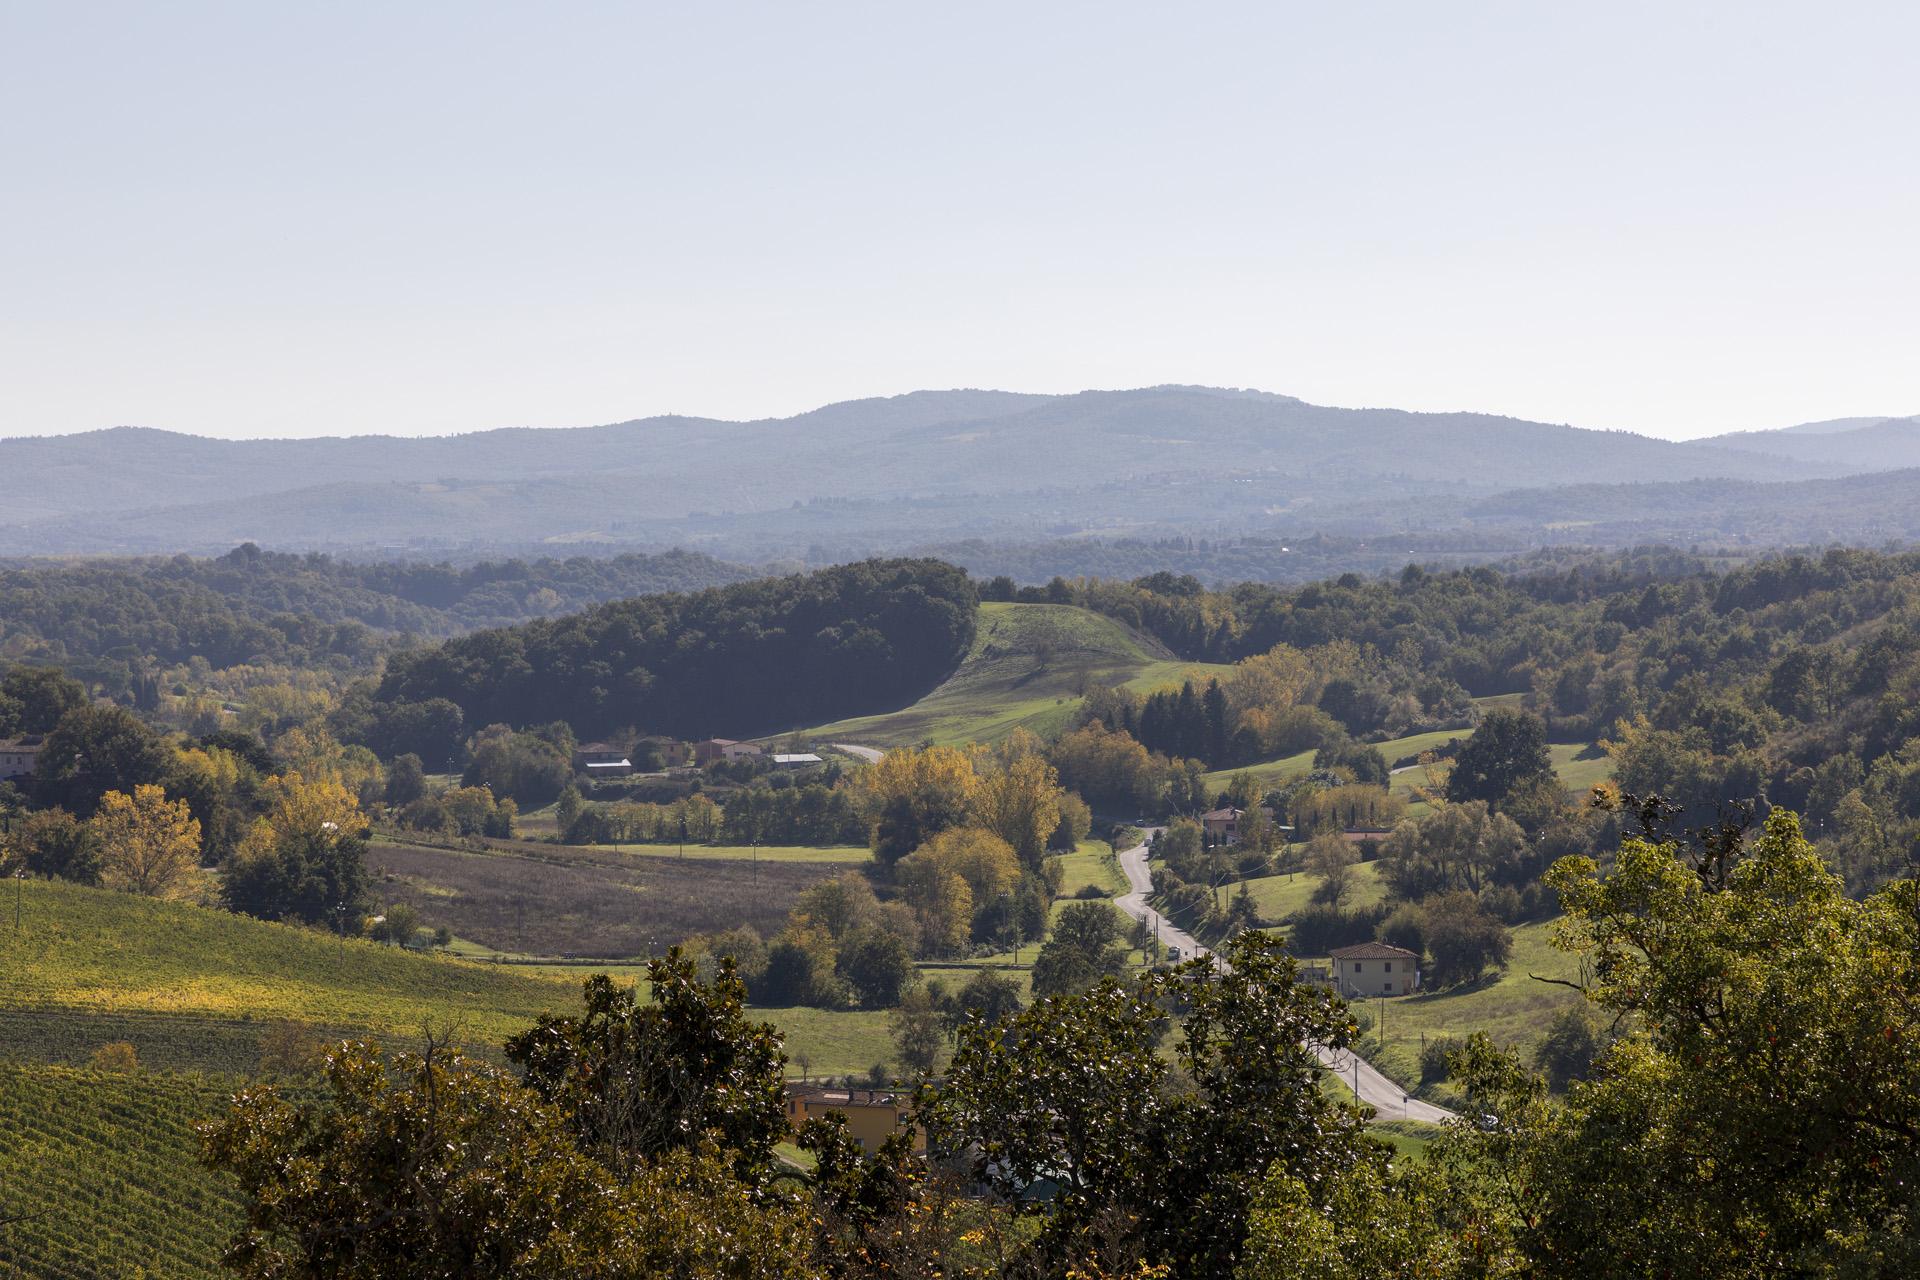 Villa Cicogna view from edge of terrace over Valdarno Valley